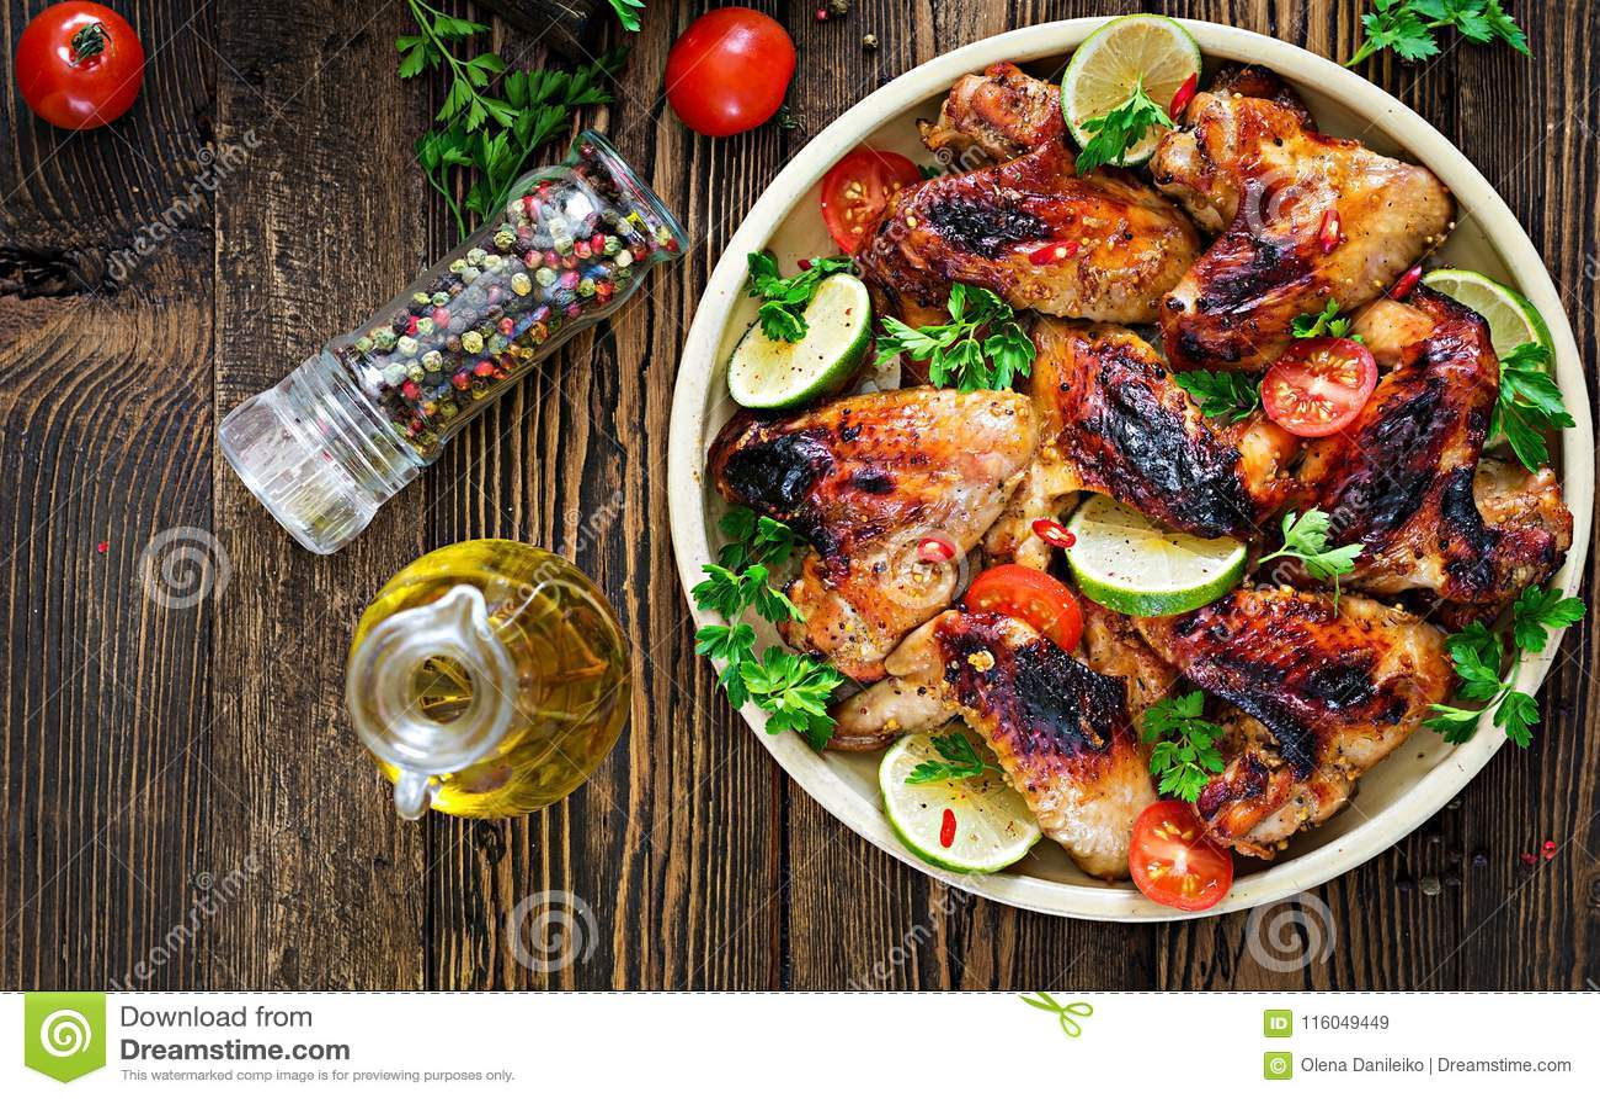 Alas de pollo de la barbacoa en salsa dulce amarga Comida campestre